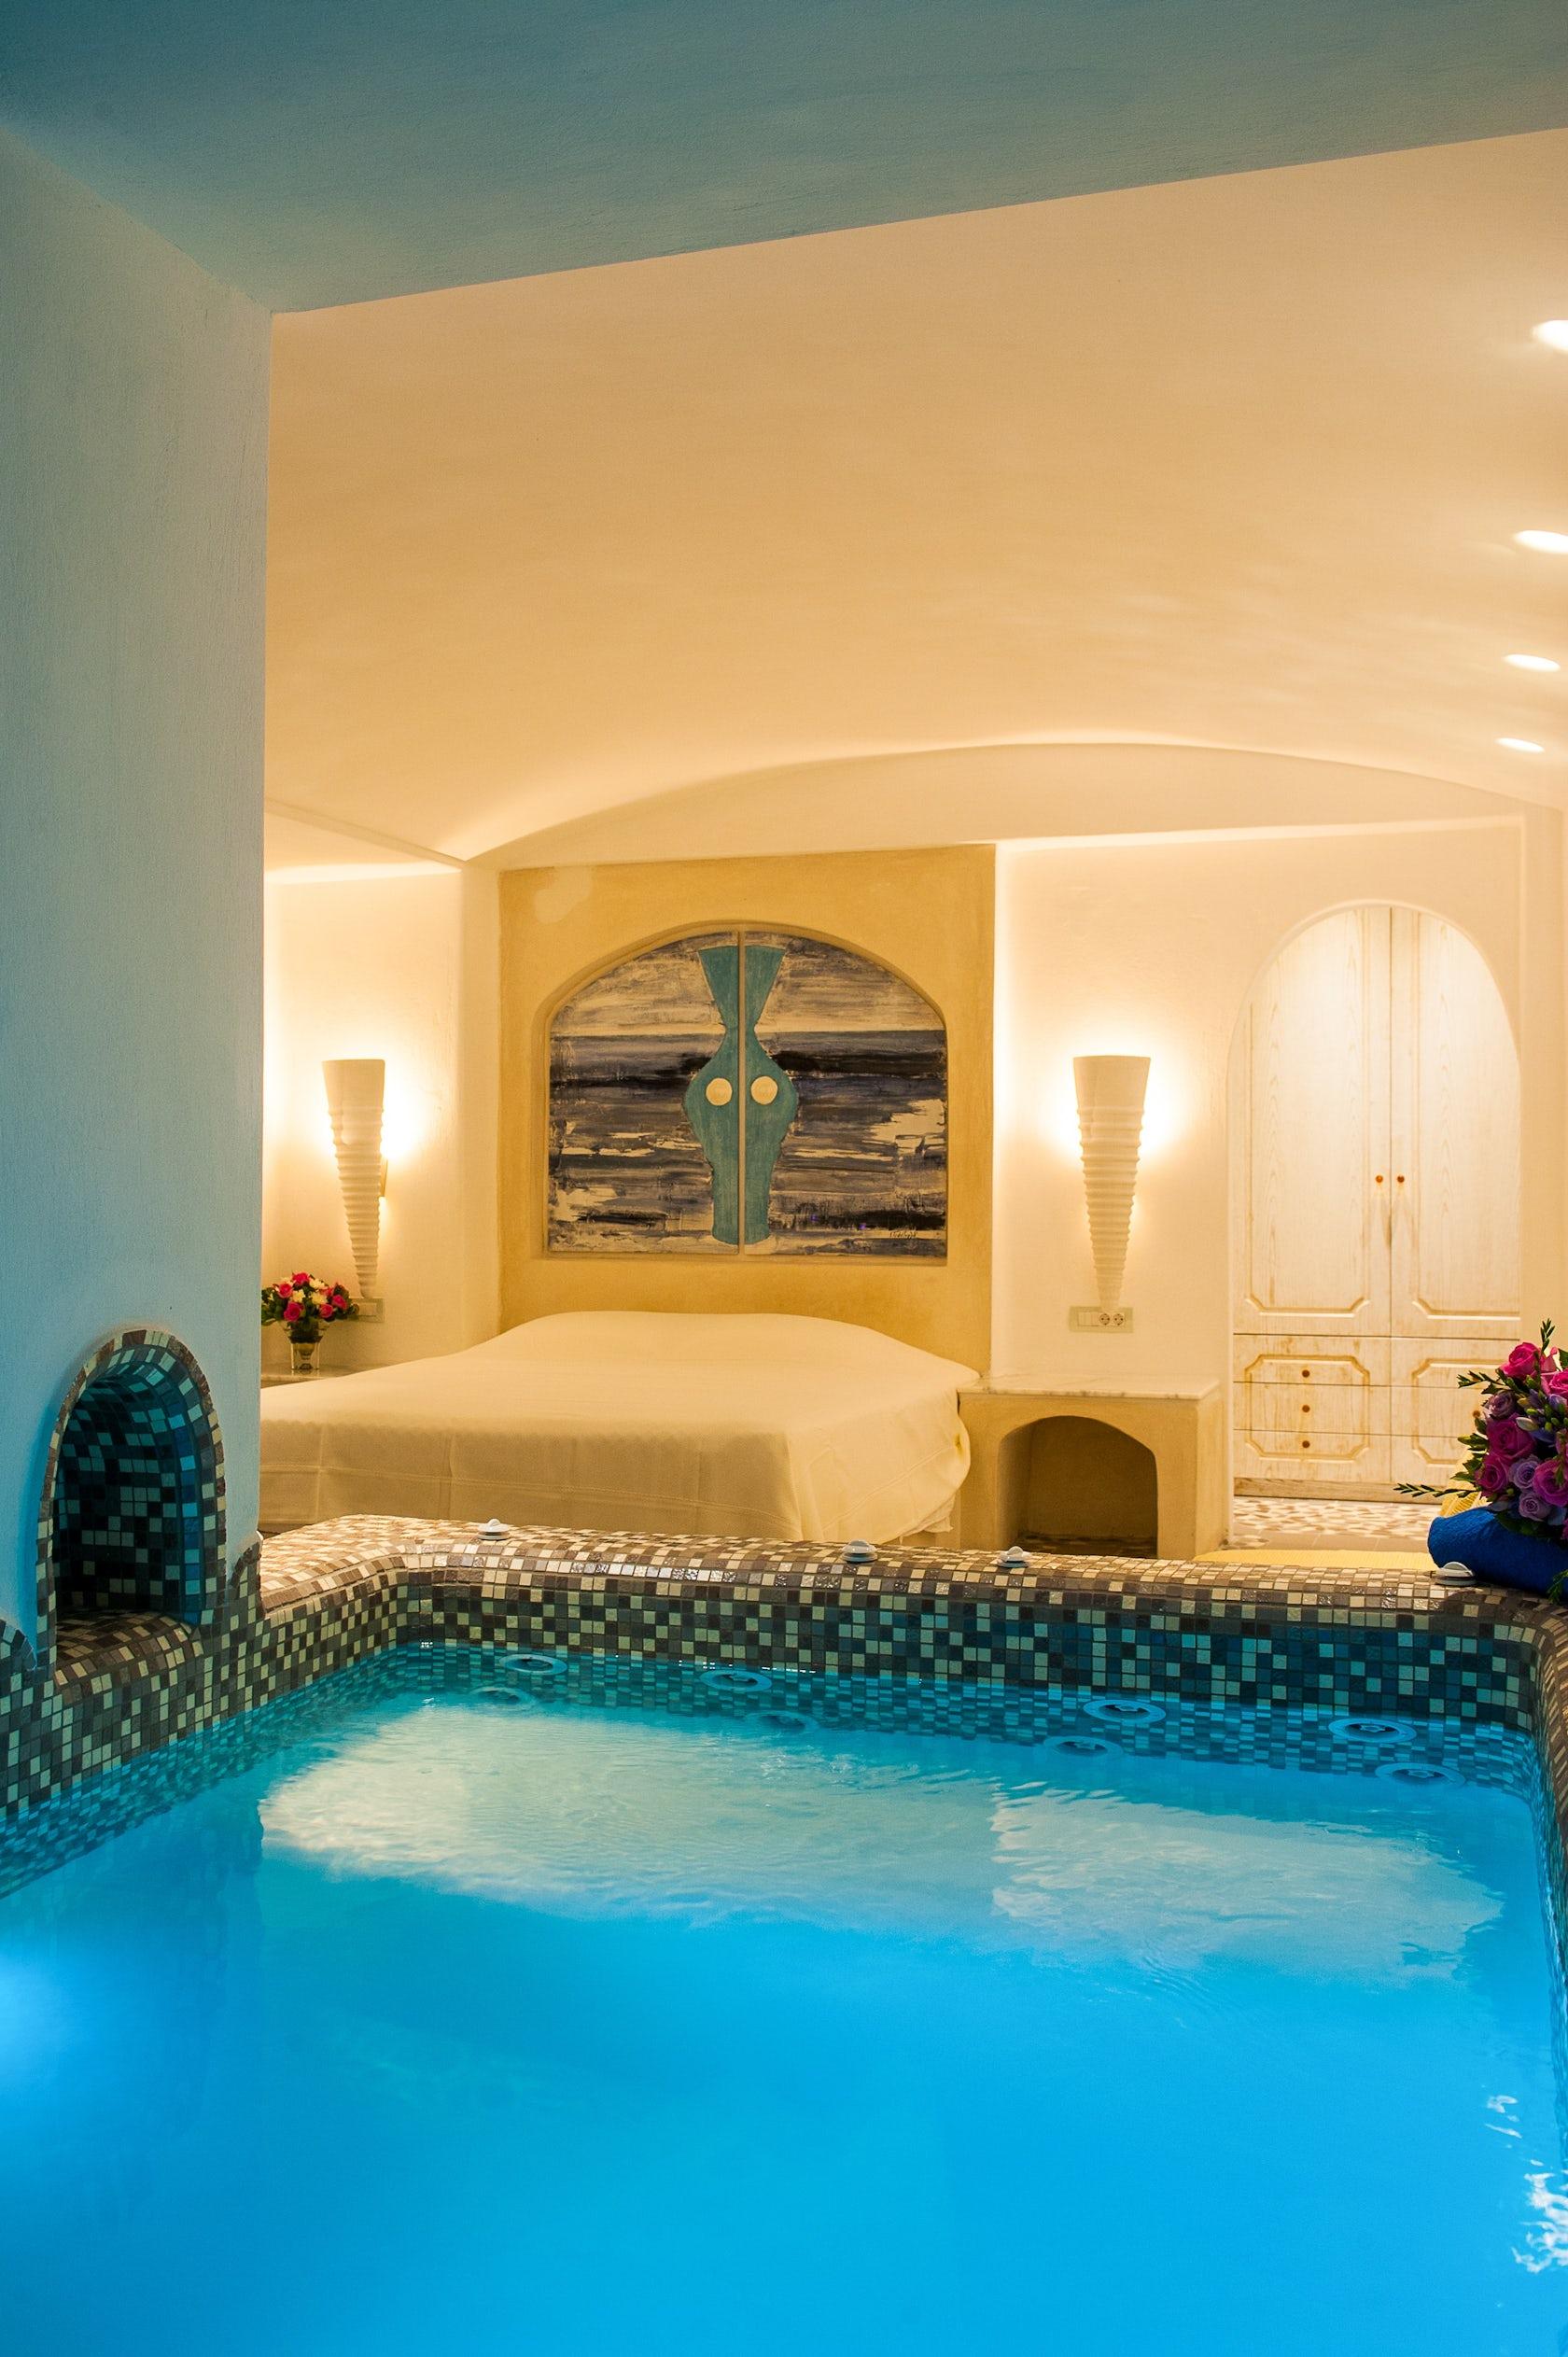 Astarte Suites Hotel In Santorini New Rooms Architizer